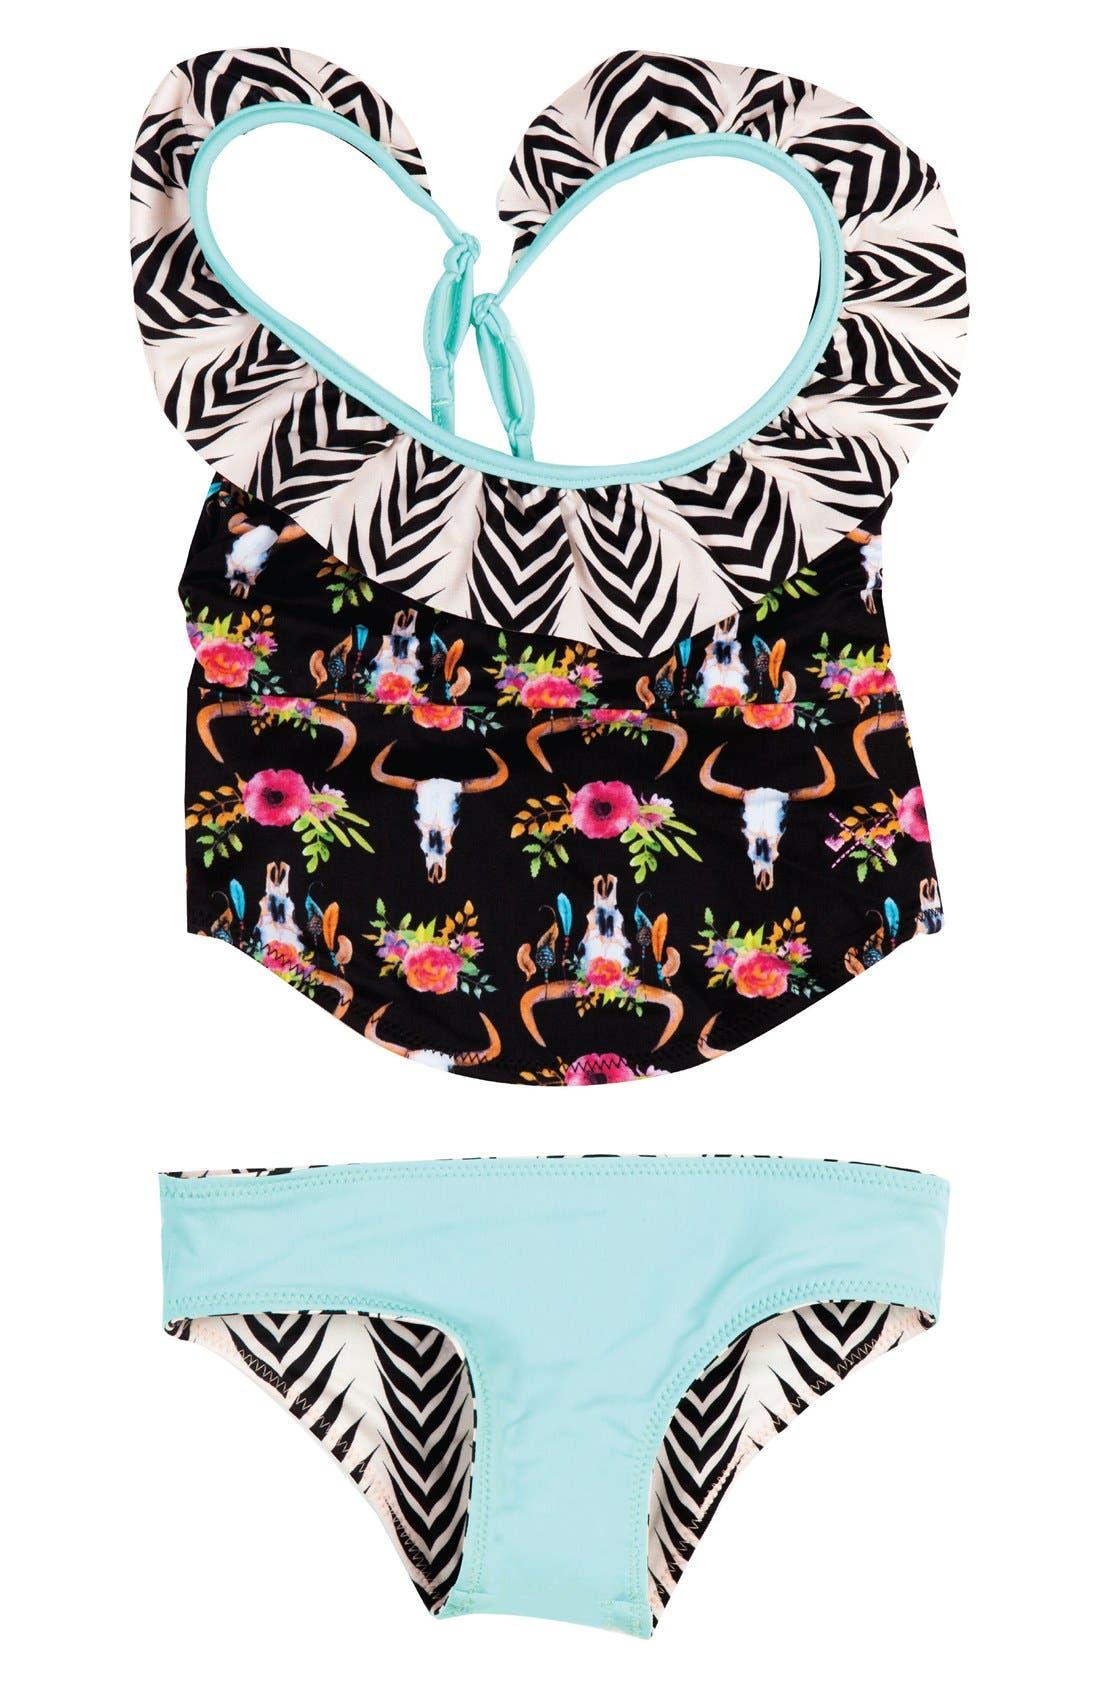 BOWIE JAMES Dreamcatcher Two-Piece Tankini Swimsuit